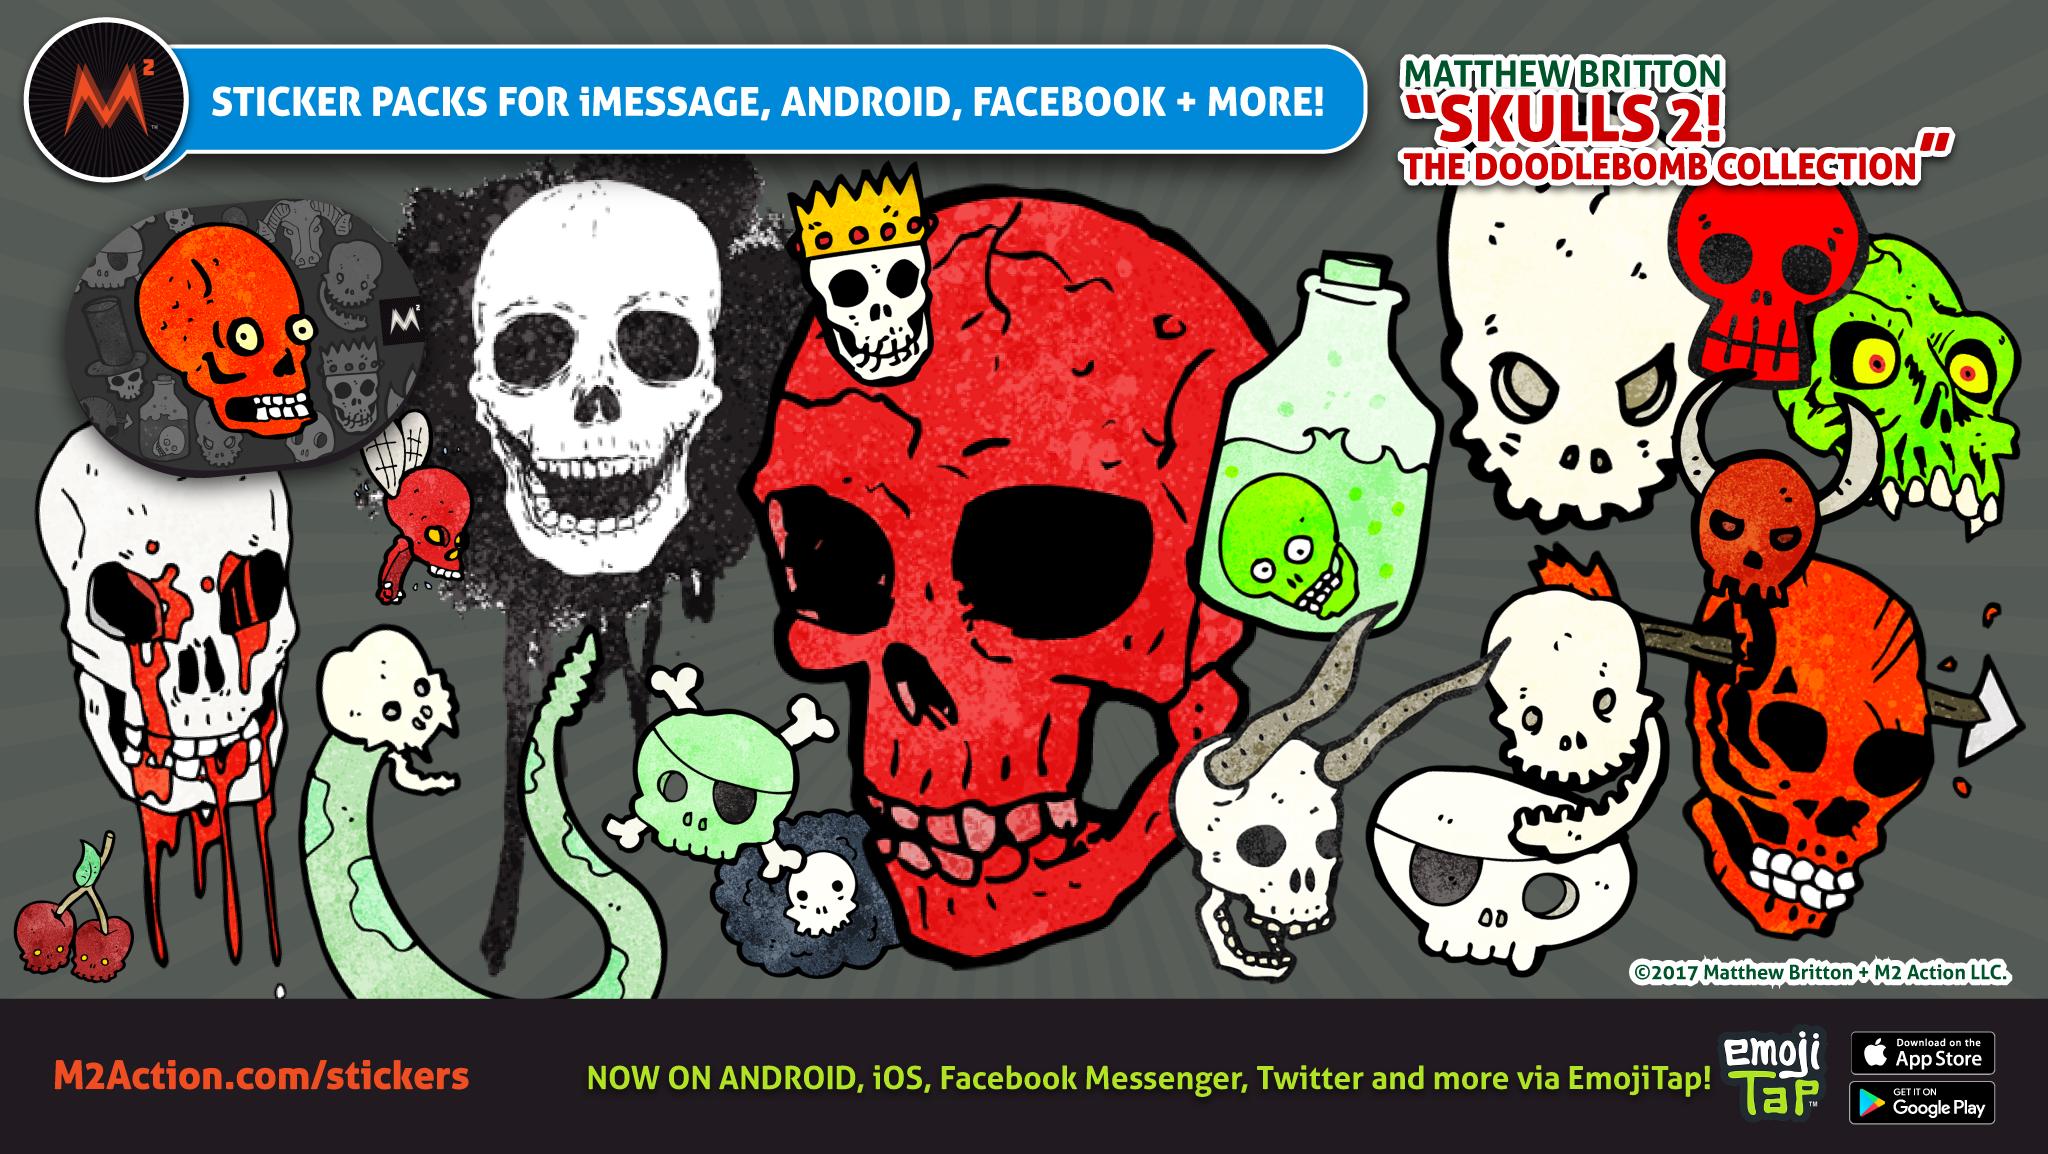 M2_Stickers_Promos_April2017_MatthewBritton_Skulls2DoodleBomb.png